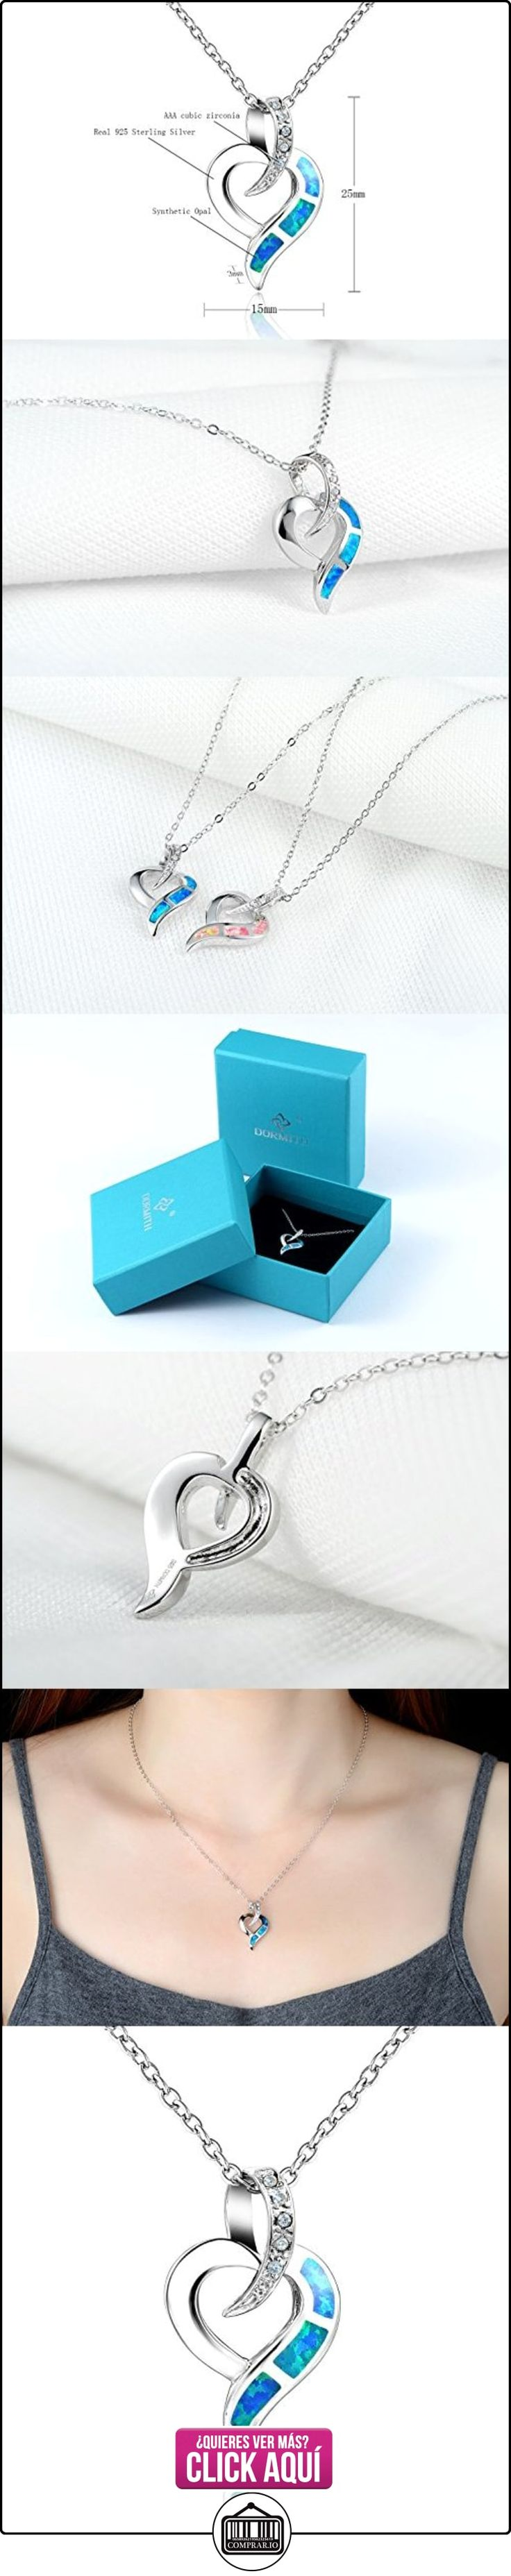 Dormith® Plata de ley 925 Ópalo azul sintético collares para las mujeres Corazón colgante de collar rodio moda joyas  ✿ Joyas para mujer - Las mejores ofertas ✿ ▬► Ver oferta: http://comprar.io/goto/B00T7G38XO